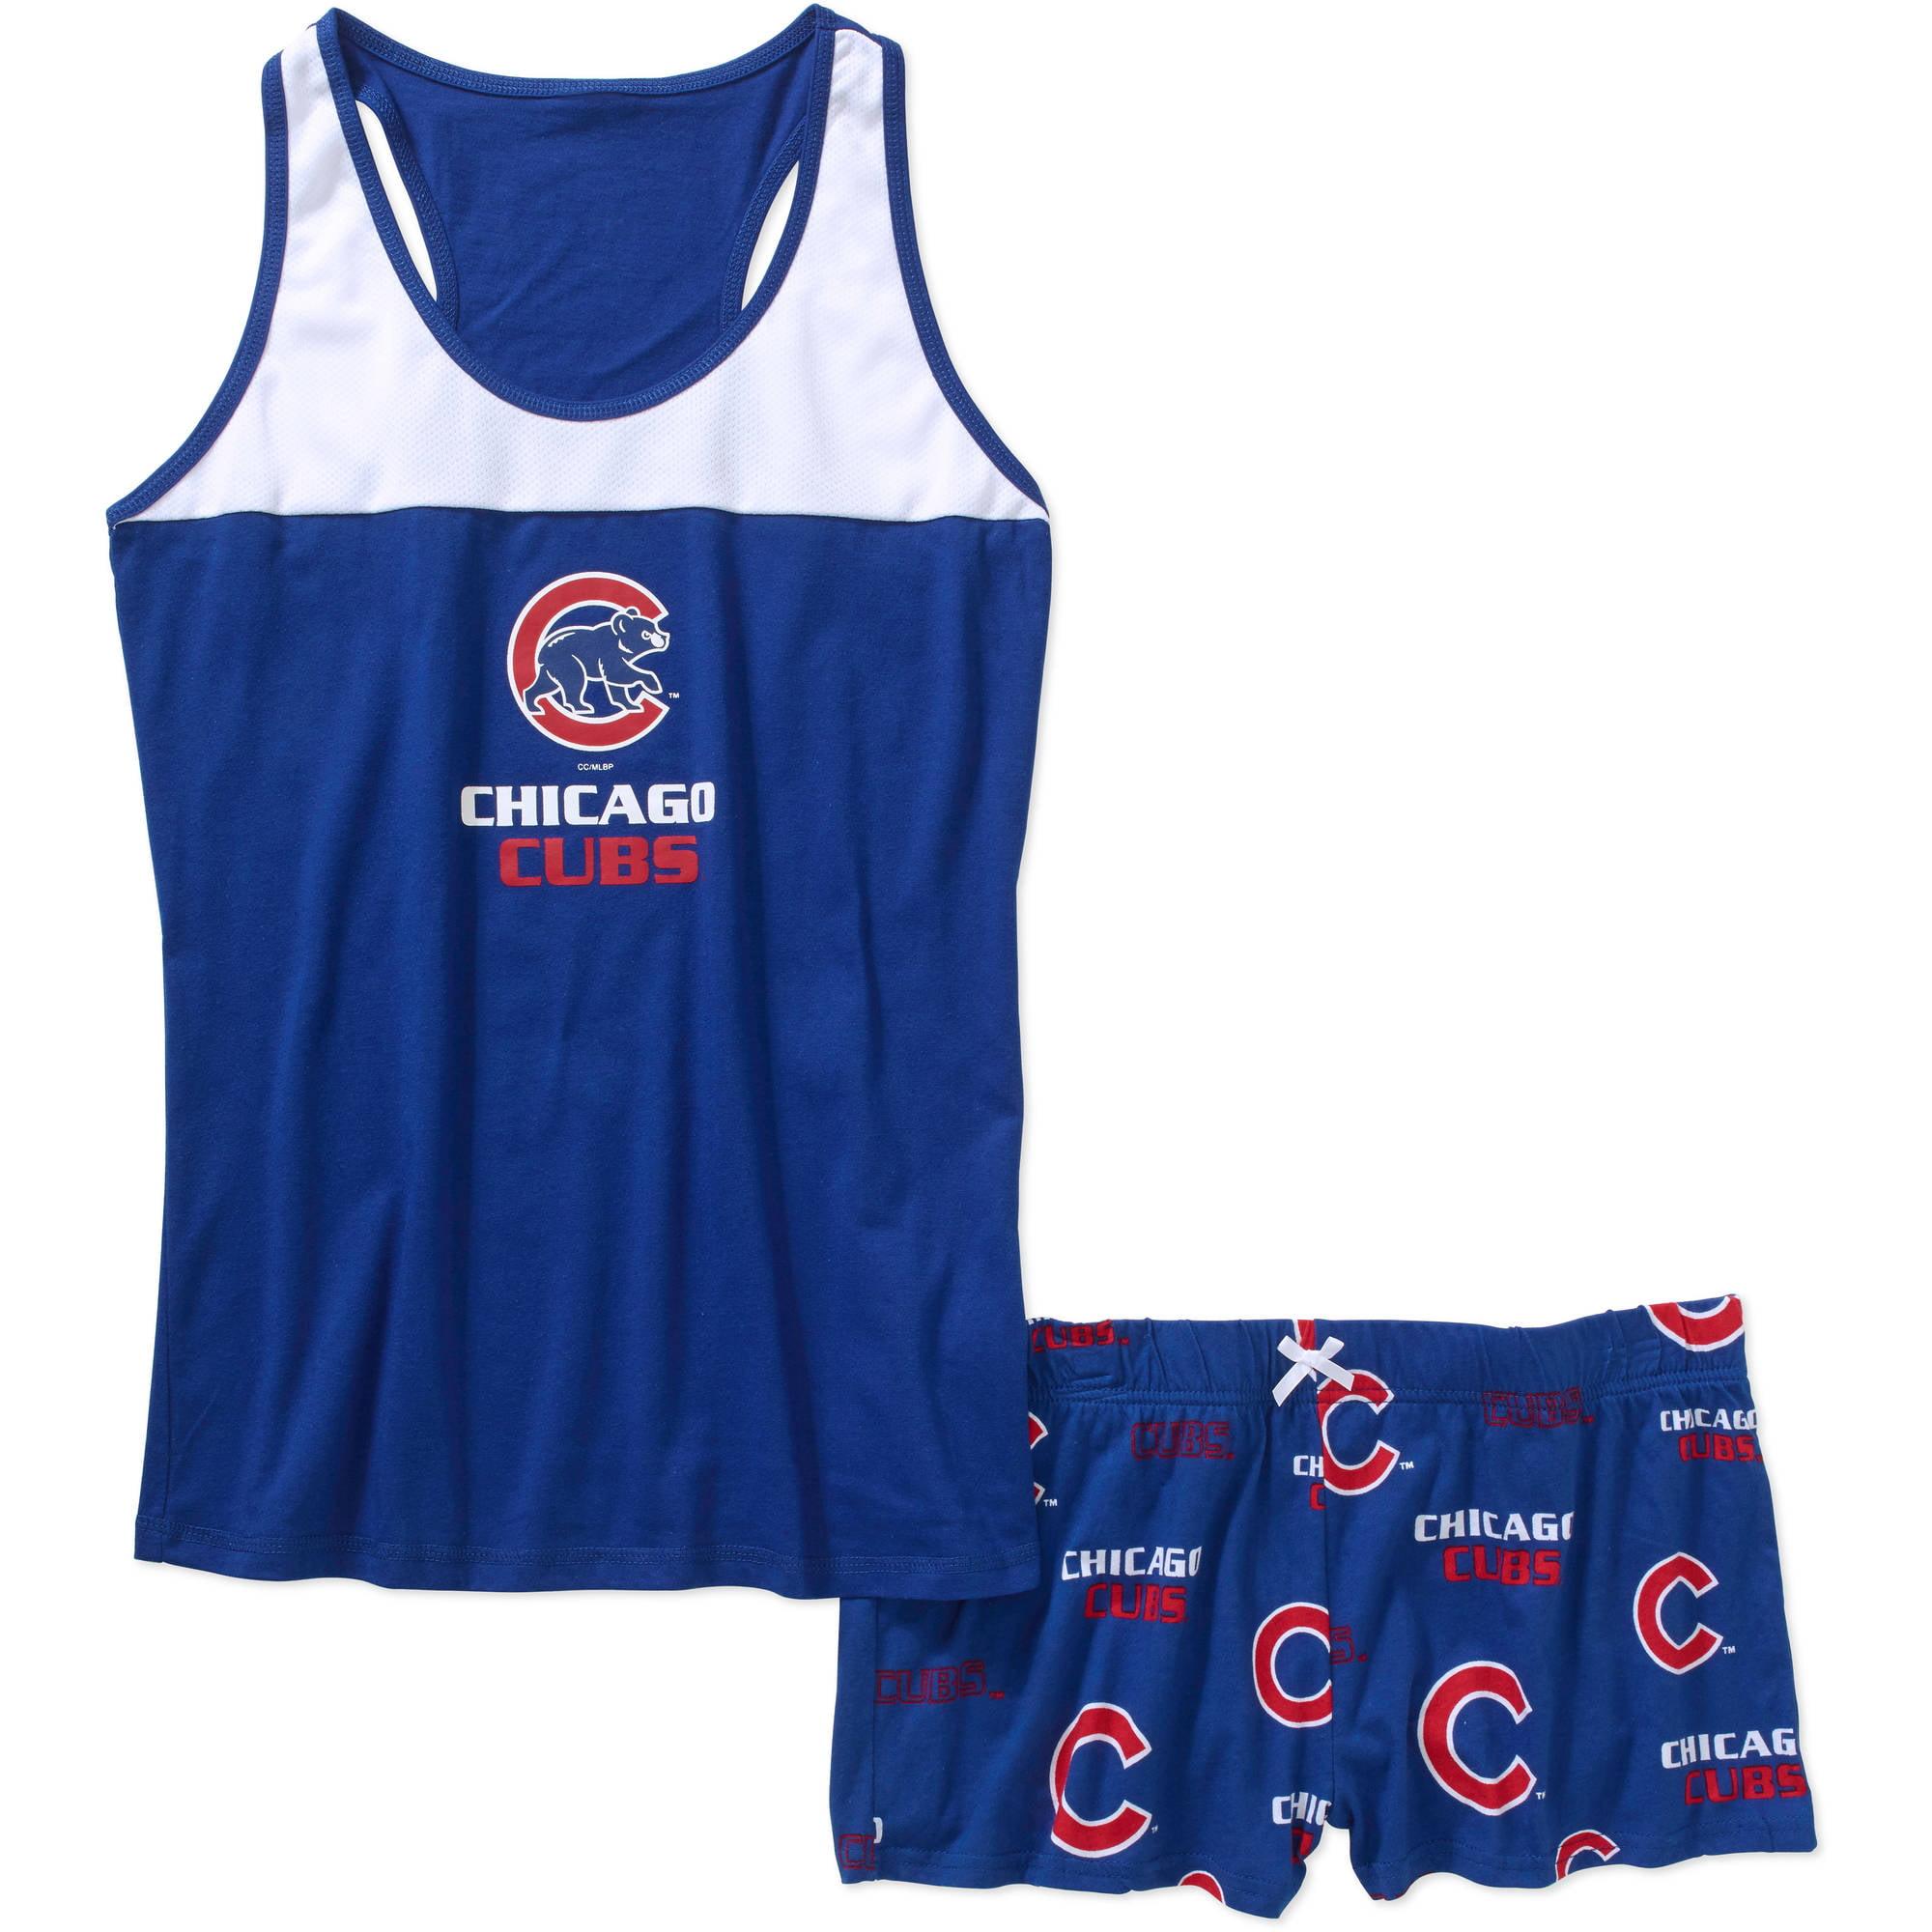 MLB - MLB Women s Chicago Cubs Tank Top and Shorts Set - Walmart.com 11a3ca02cd